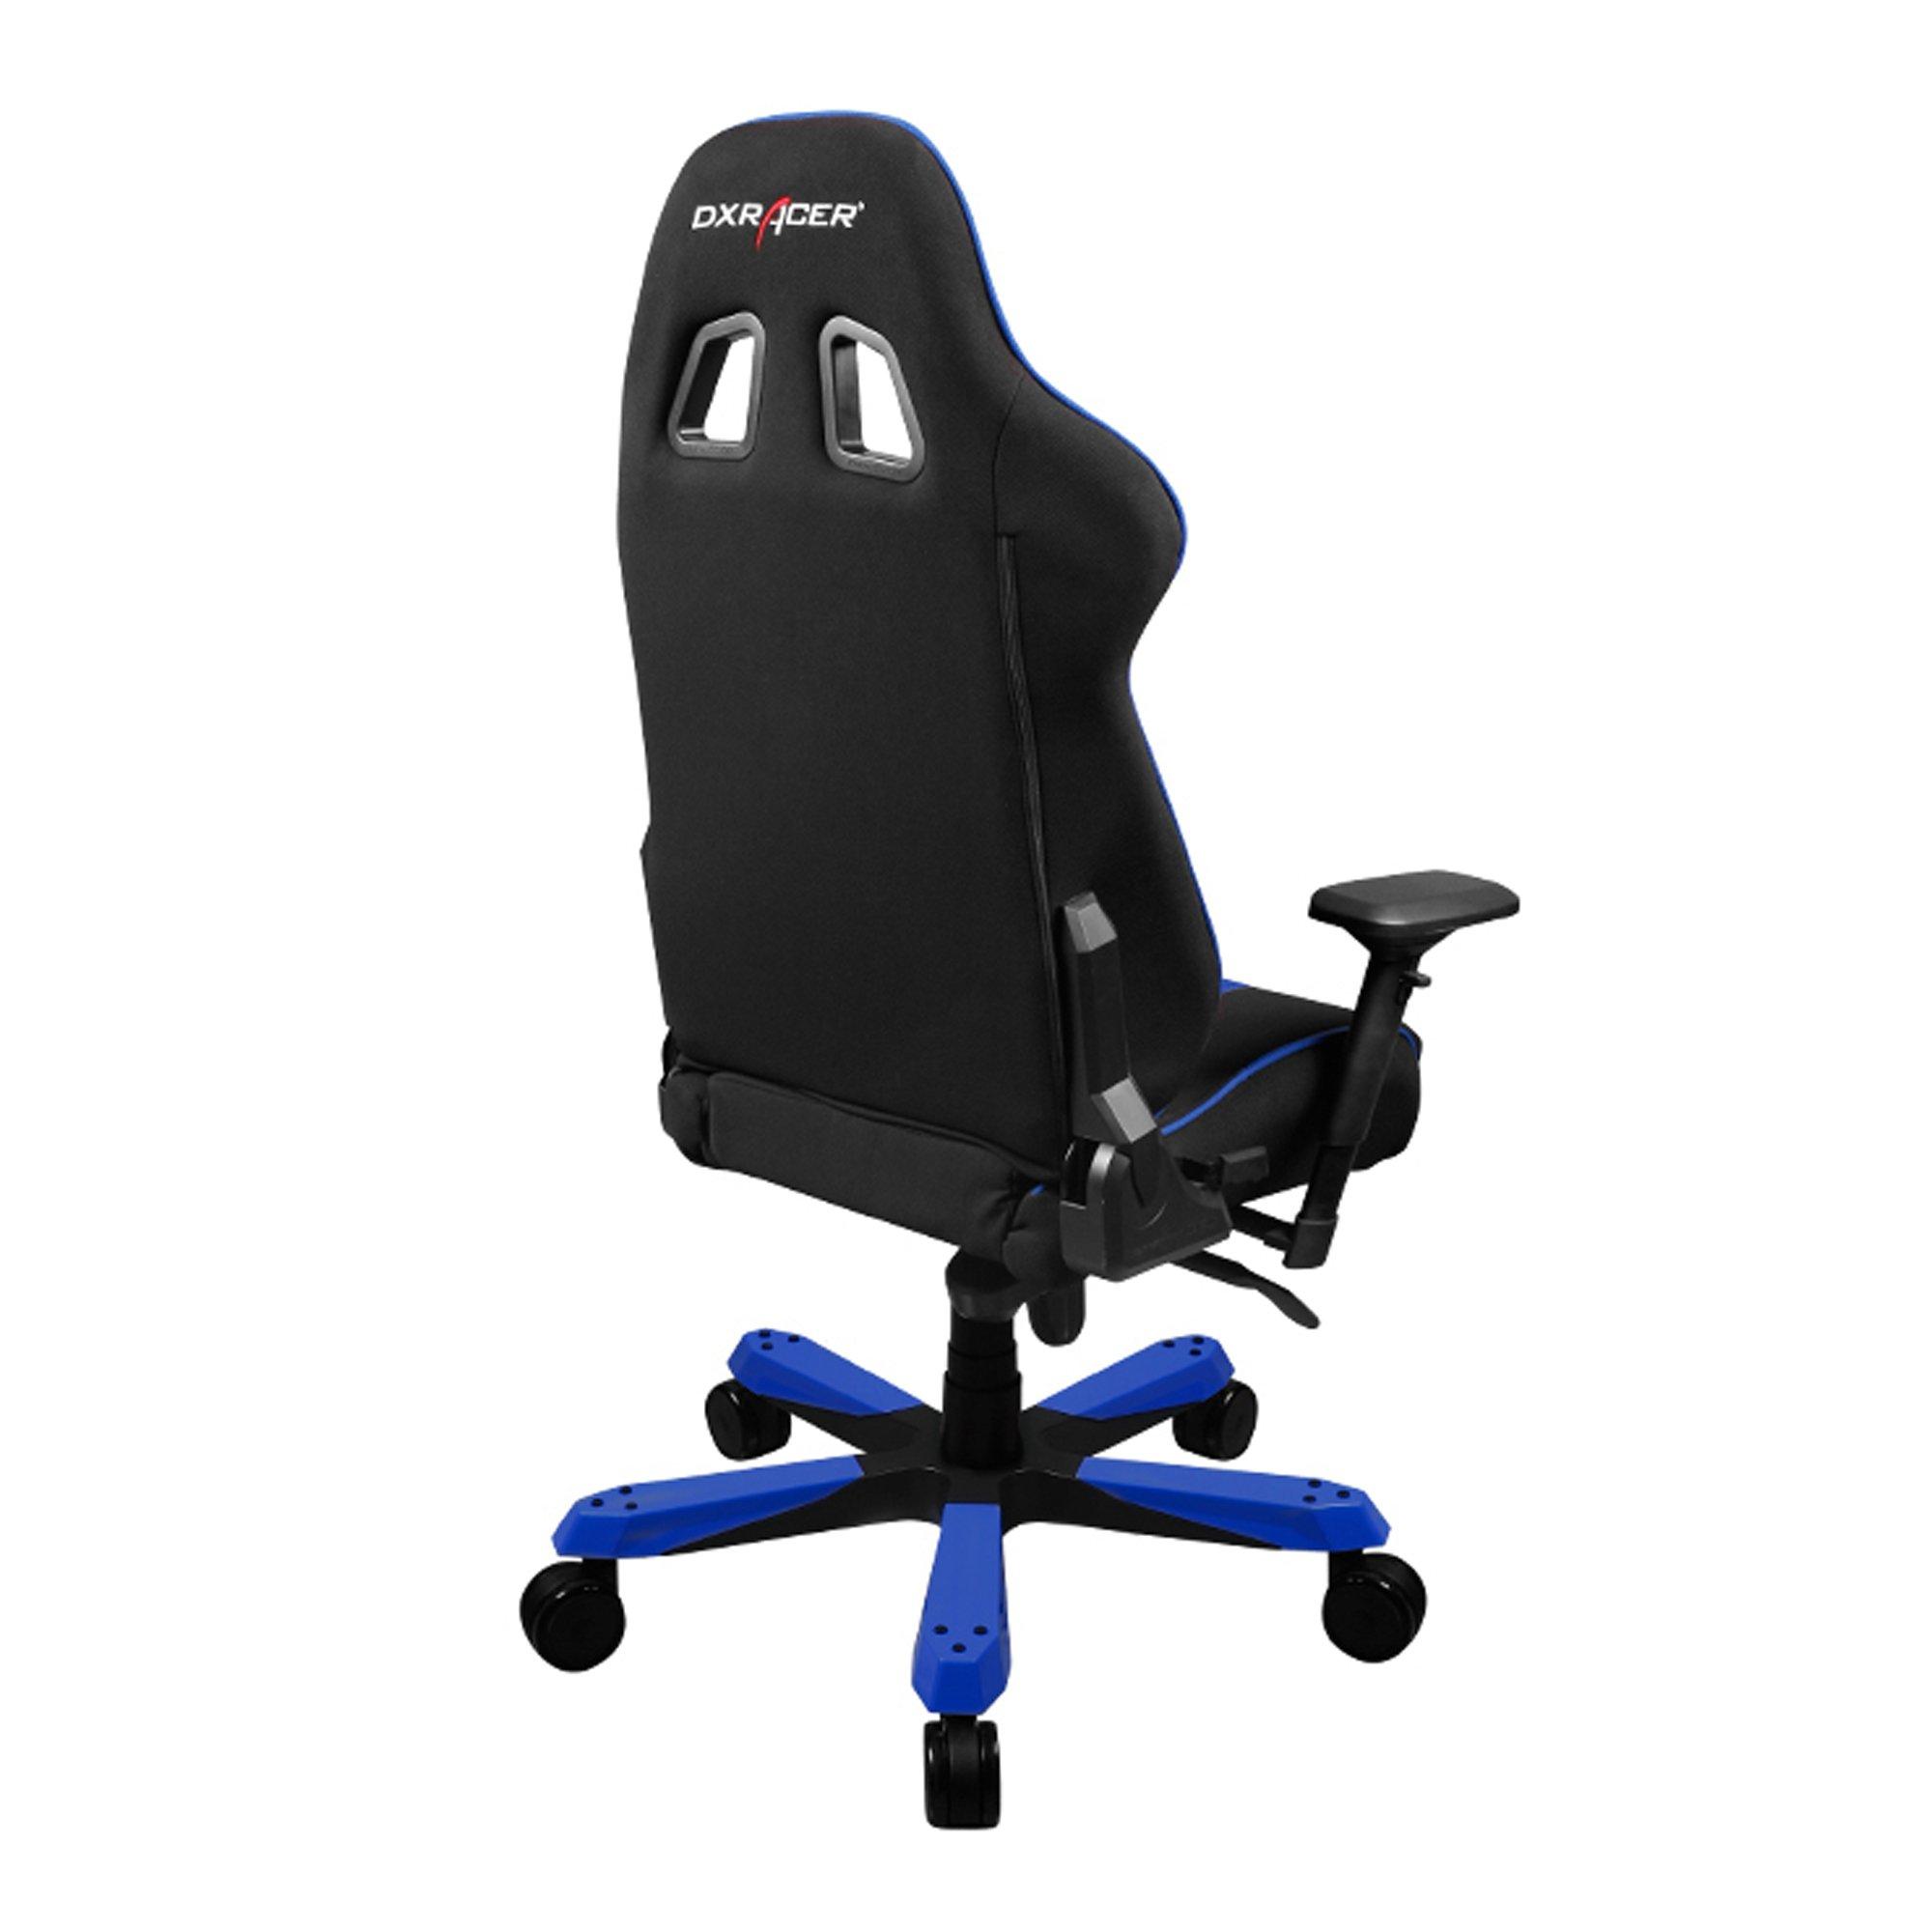 dxracer chair accessories unusual uk galleon kf91 nb black blue king series racing